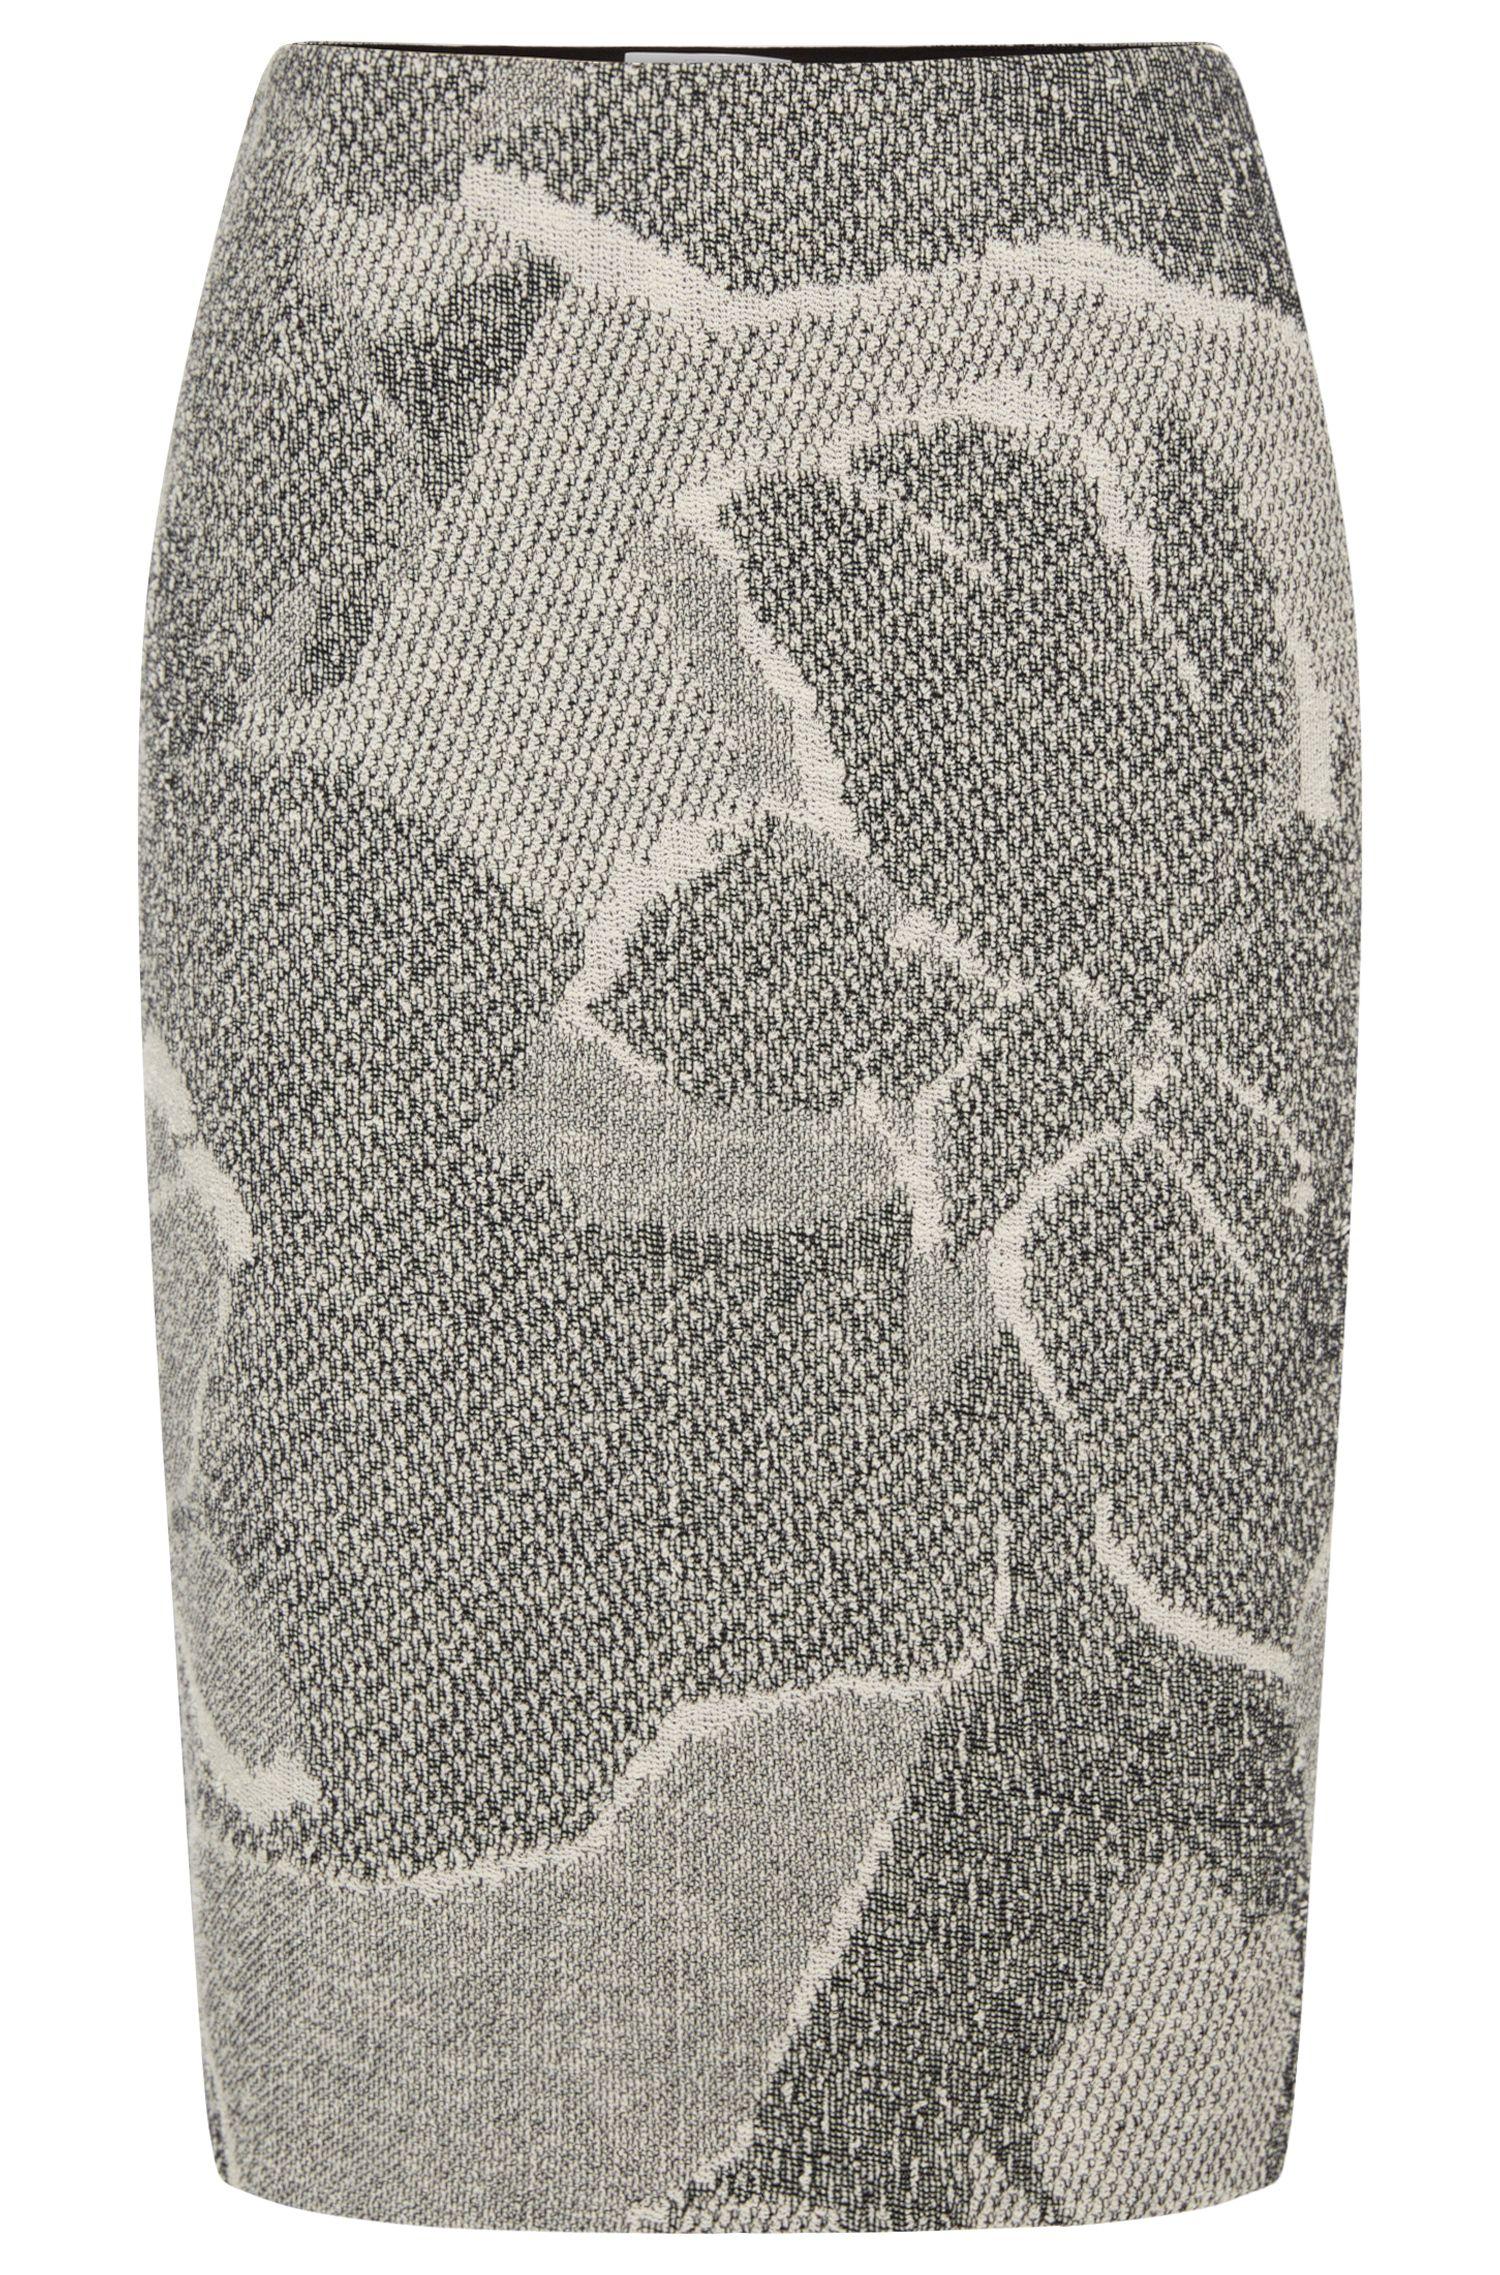 'Marala' | Cotton Blend Jacquard Floral Boucle Skirt